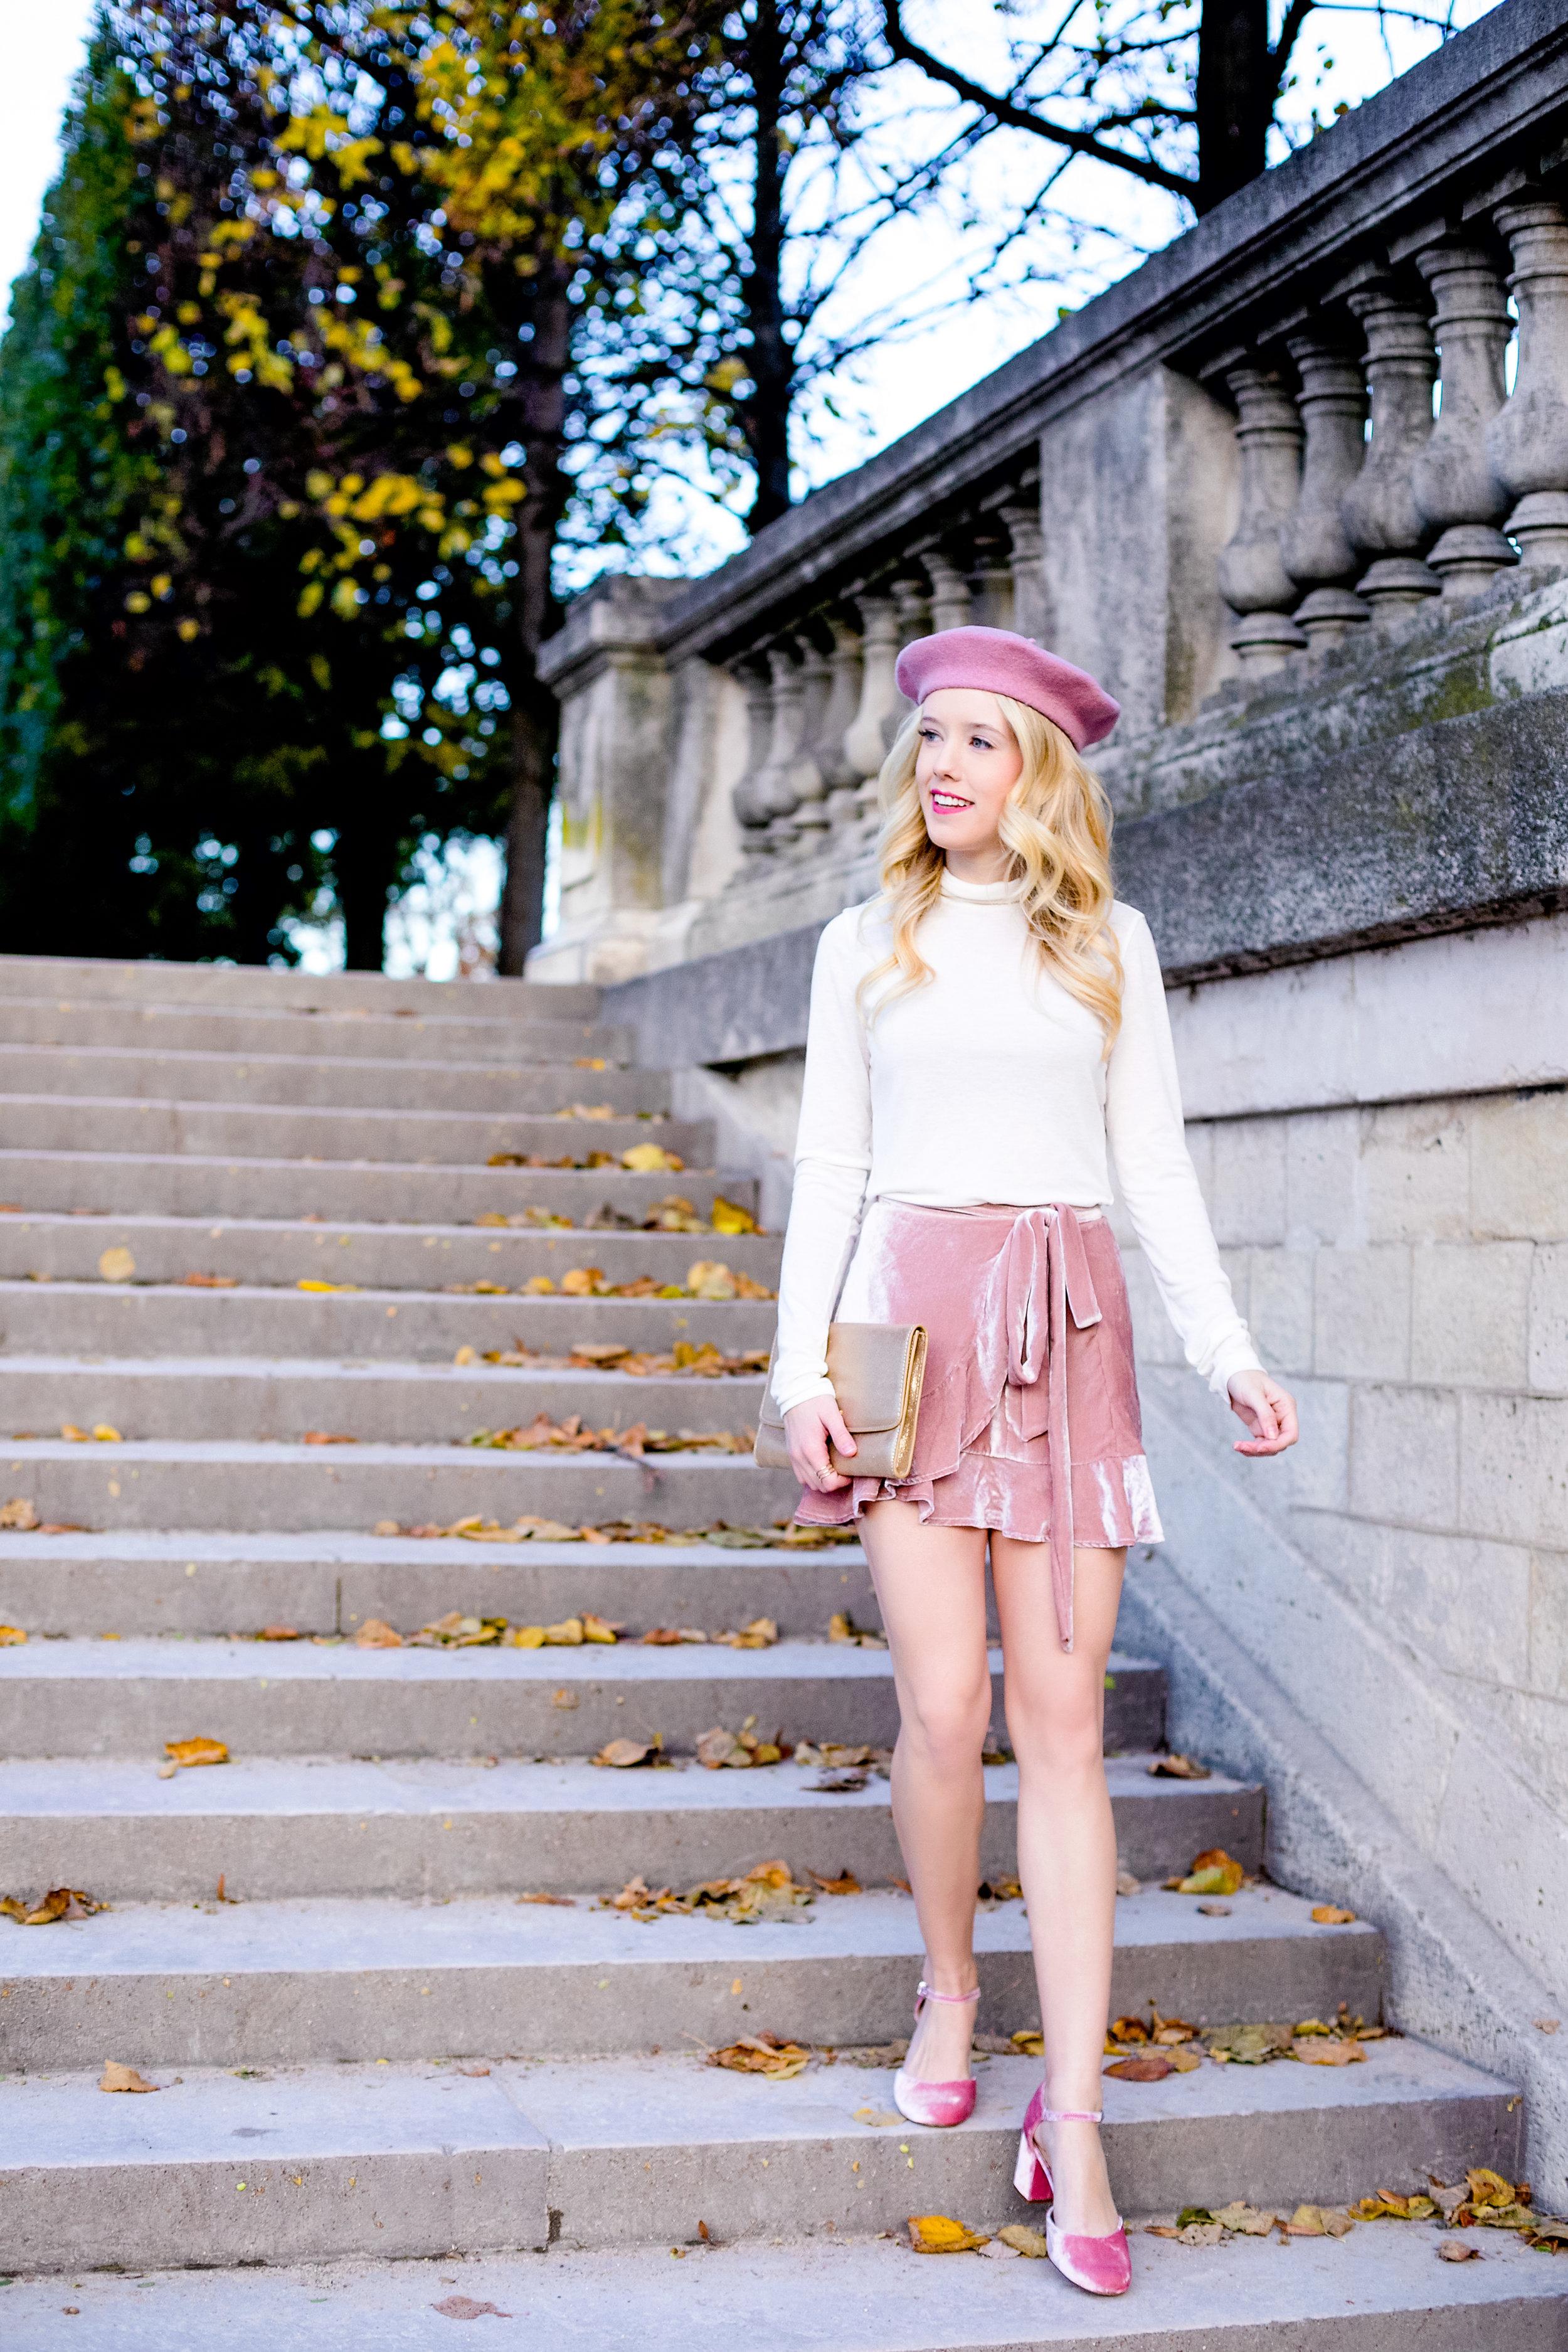 Paris_Emily7-2.jpg